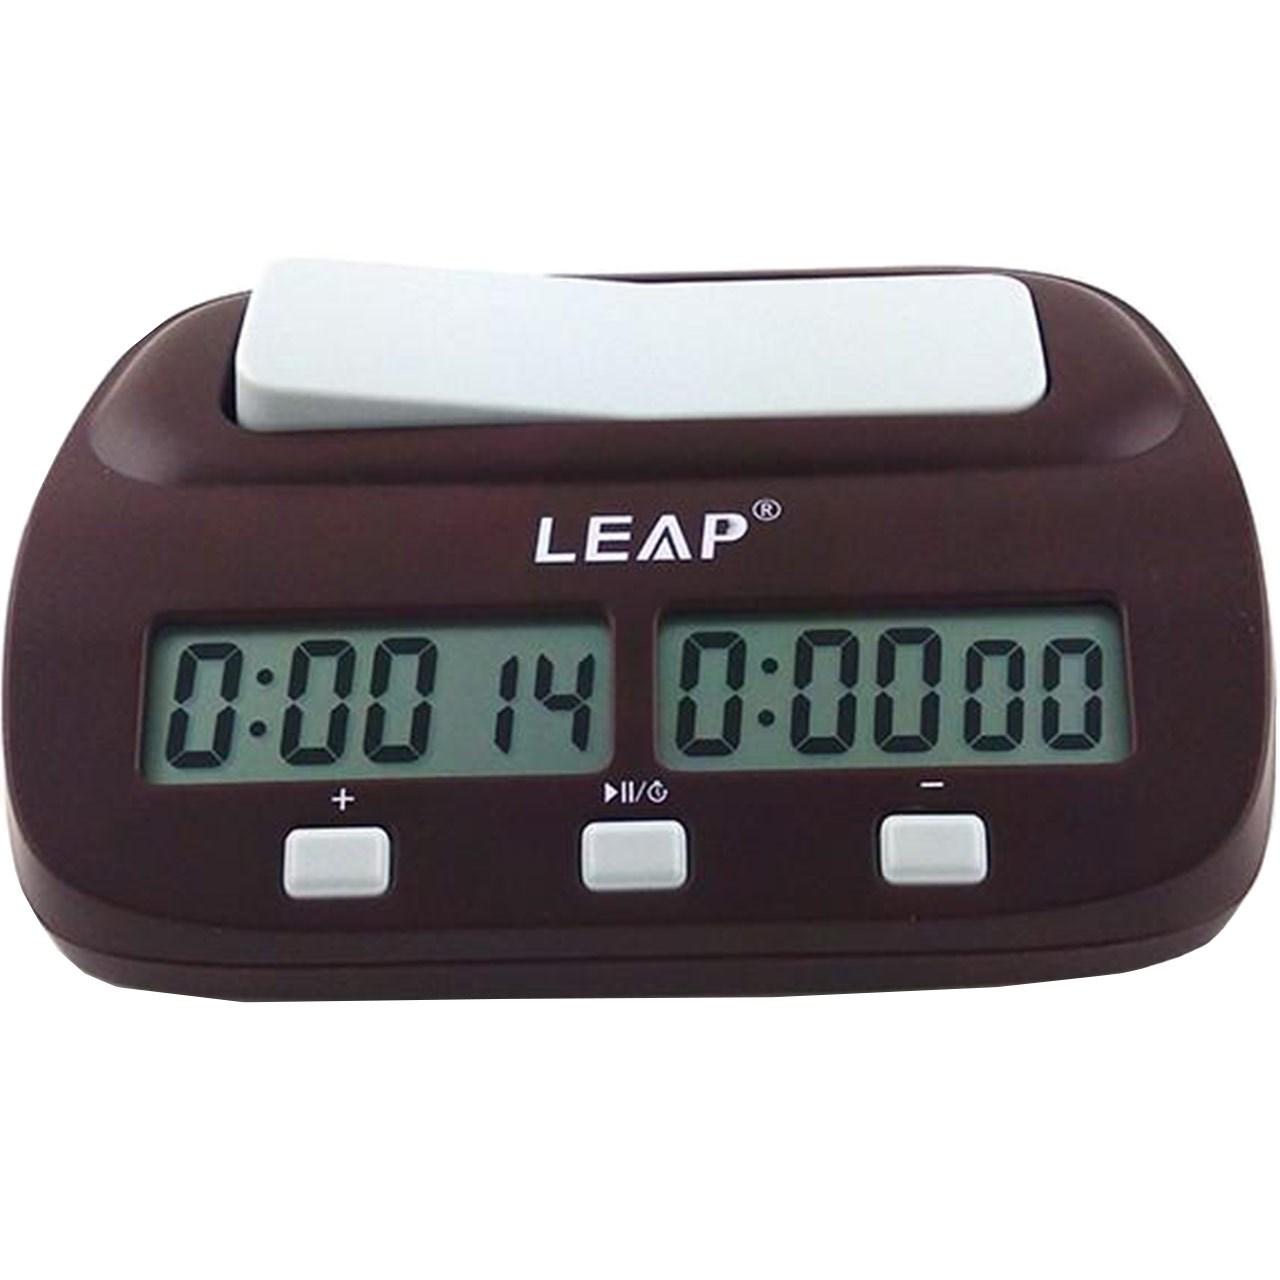 ساعت شطرنج Leap مدل PQ9907S